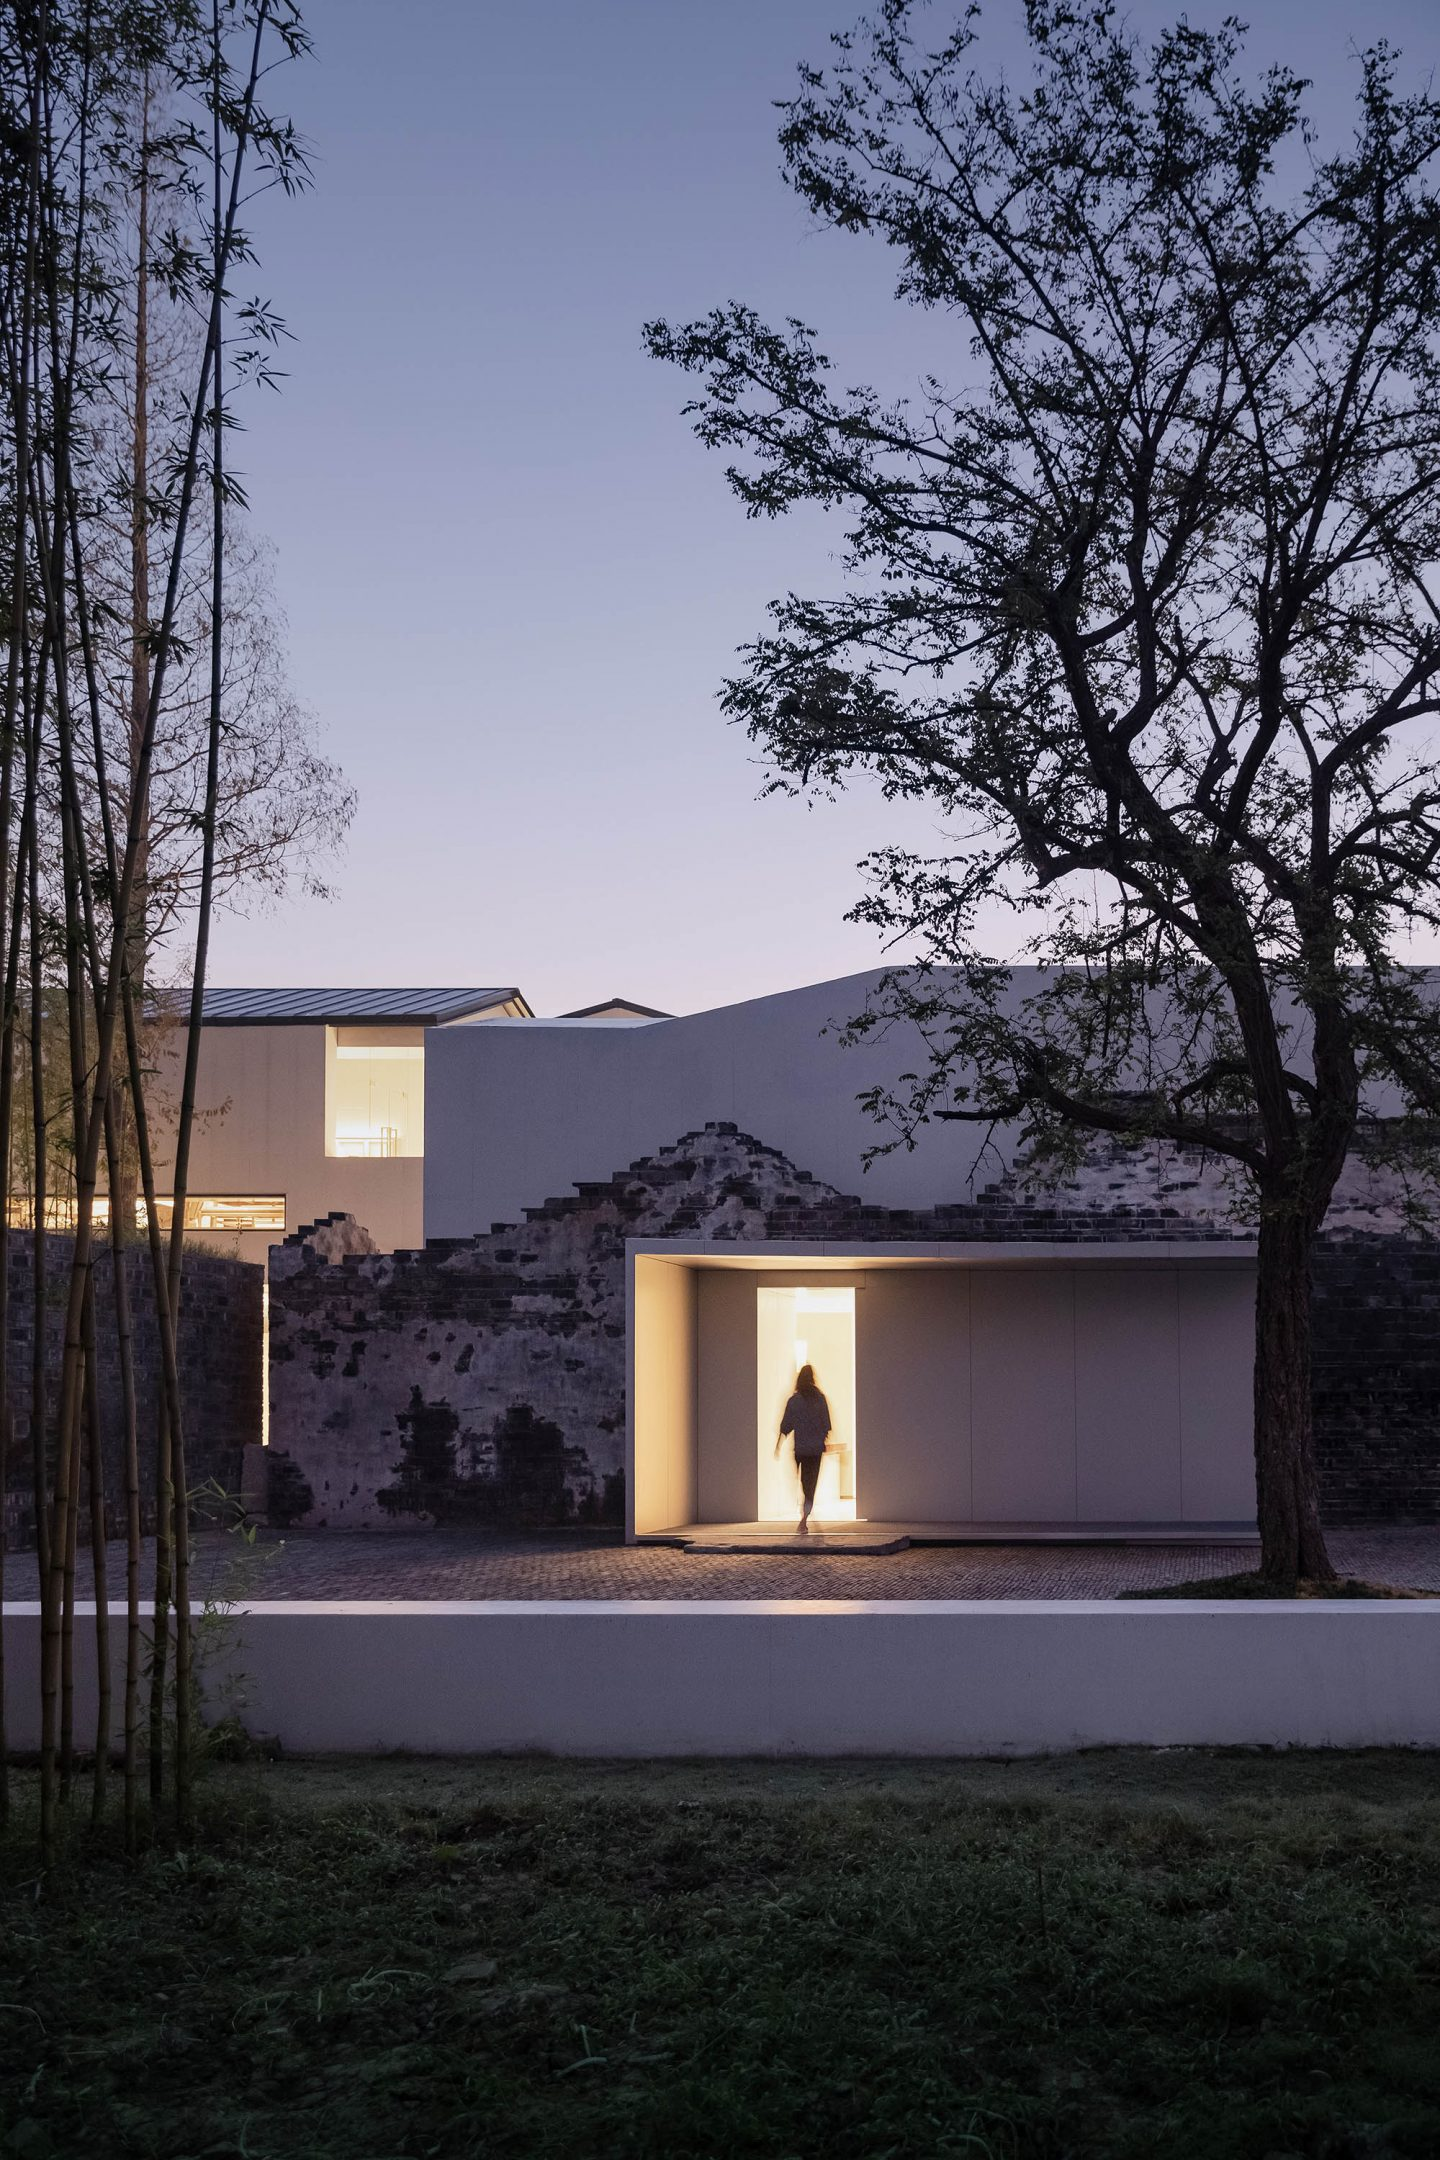 IGNANT-Architecture-HorizontalDesign-ZhangYanCulturalMuseum-10